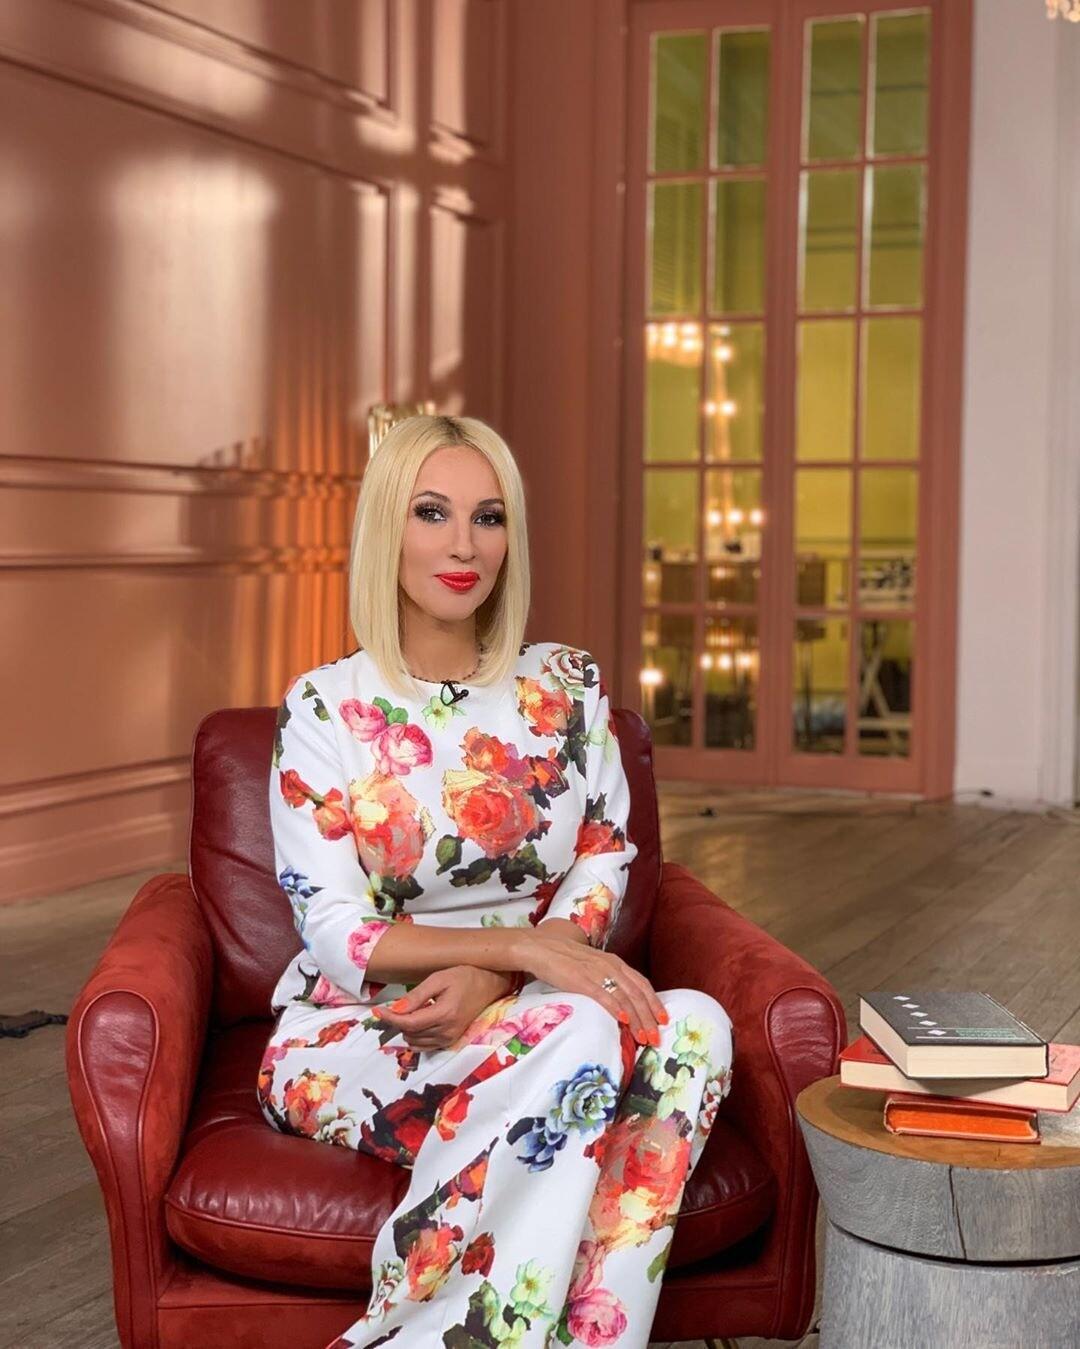 «Я разочарована»: Лера Кудрявцева отреагировала на критику ее шоу со стороны Максима Галкина